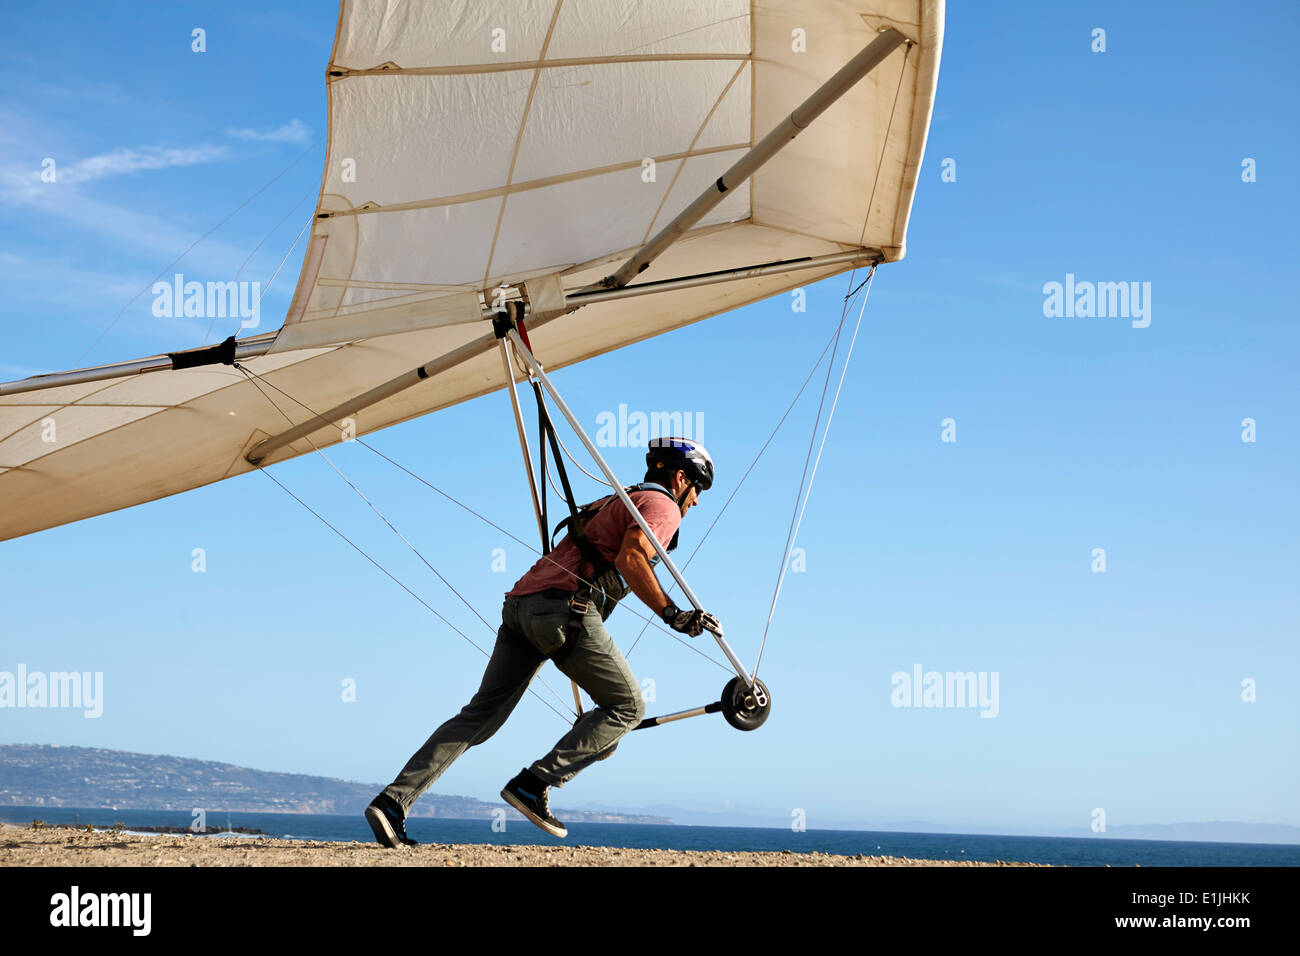 Hang glider pilot taking off - Stock Image